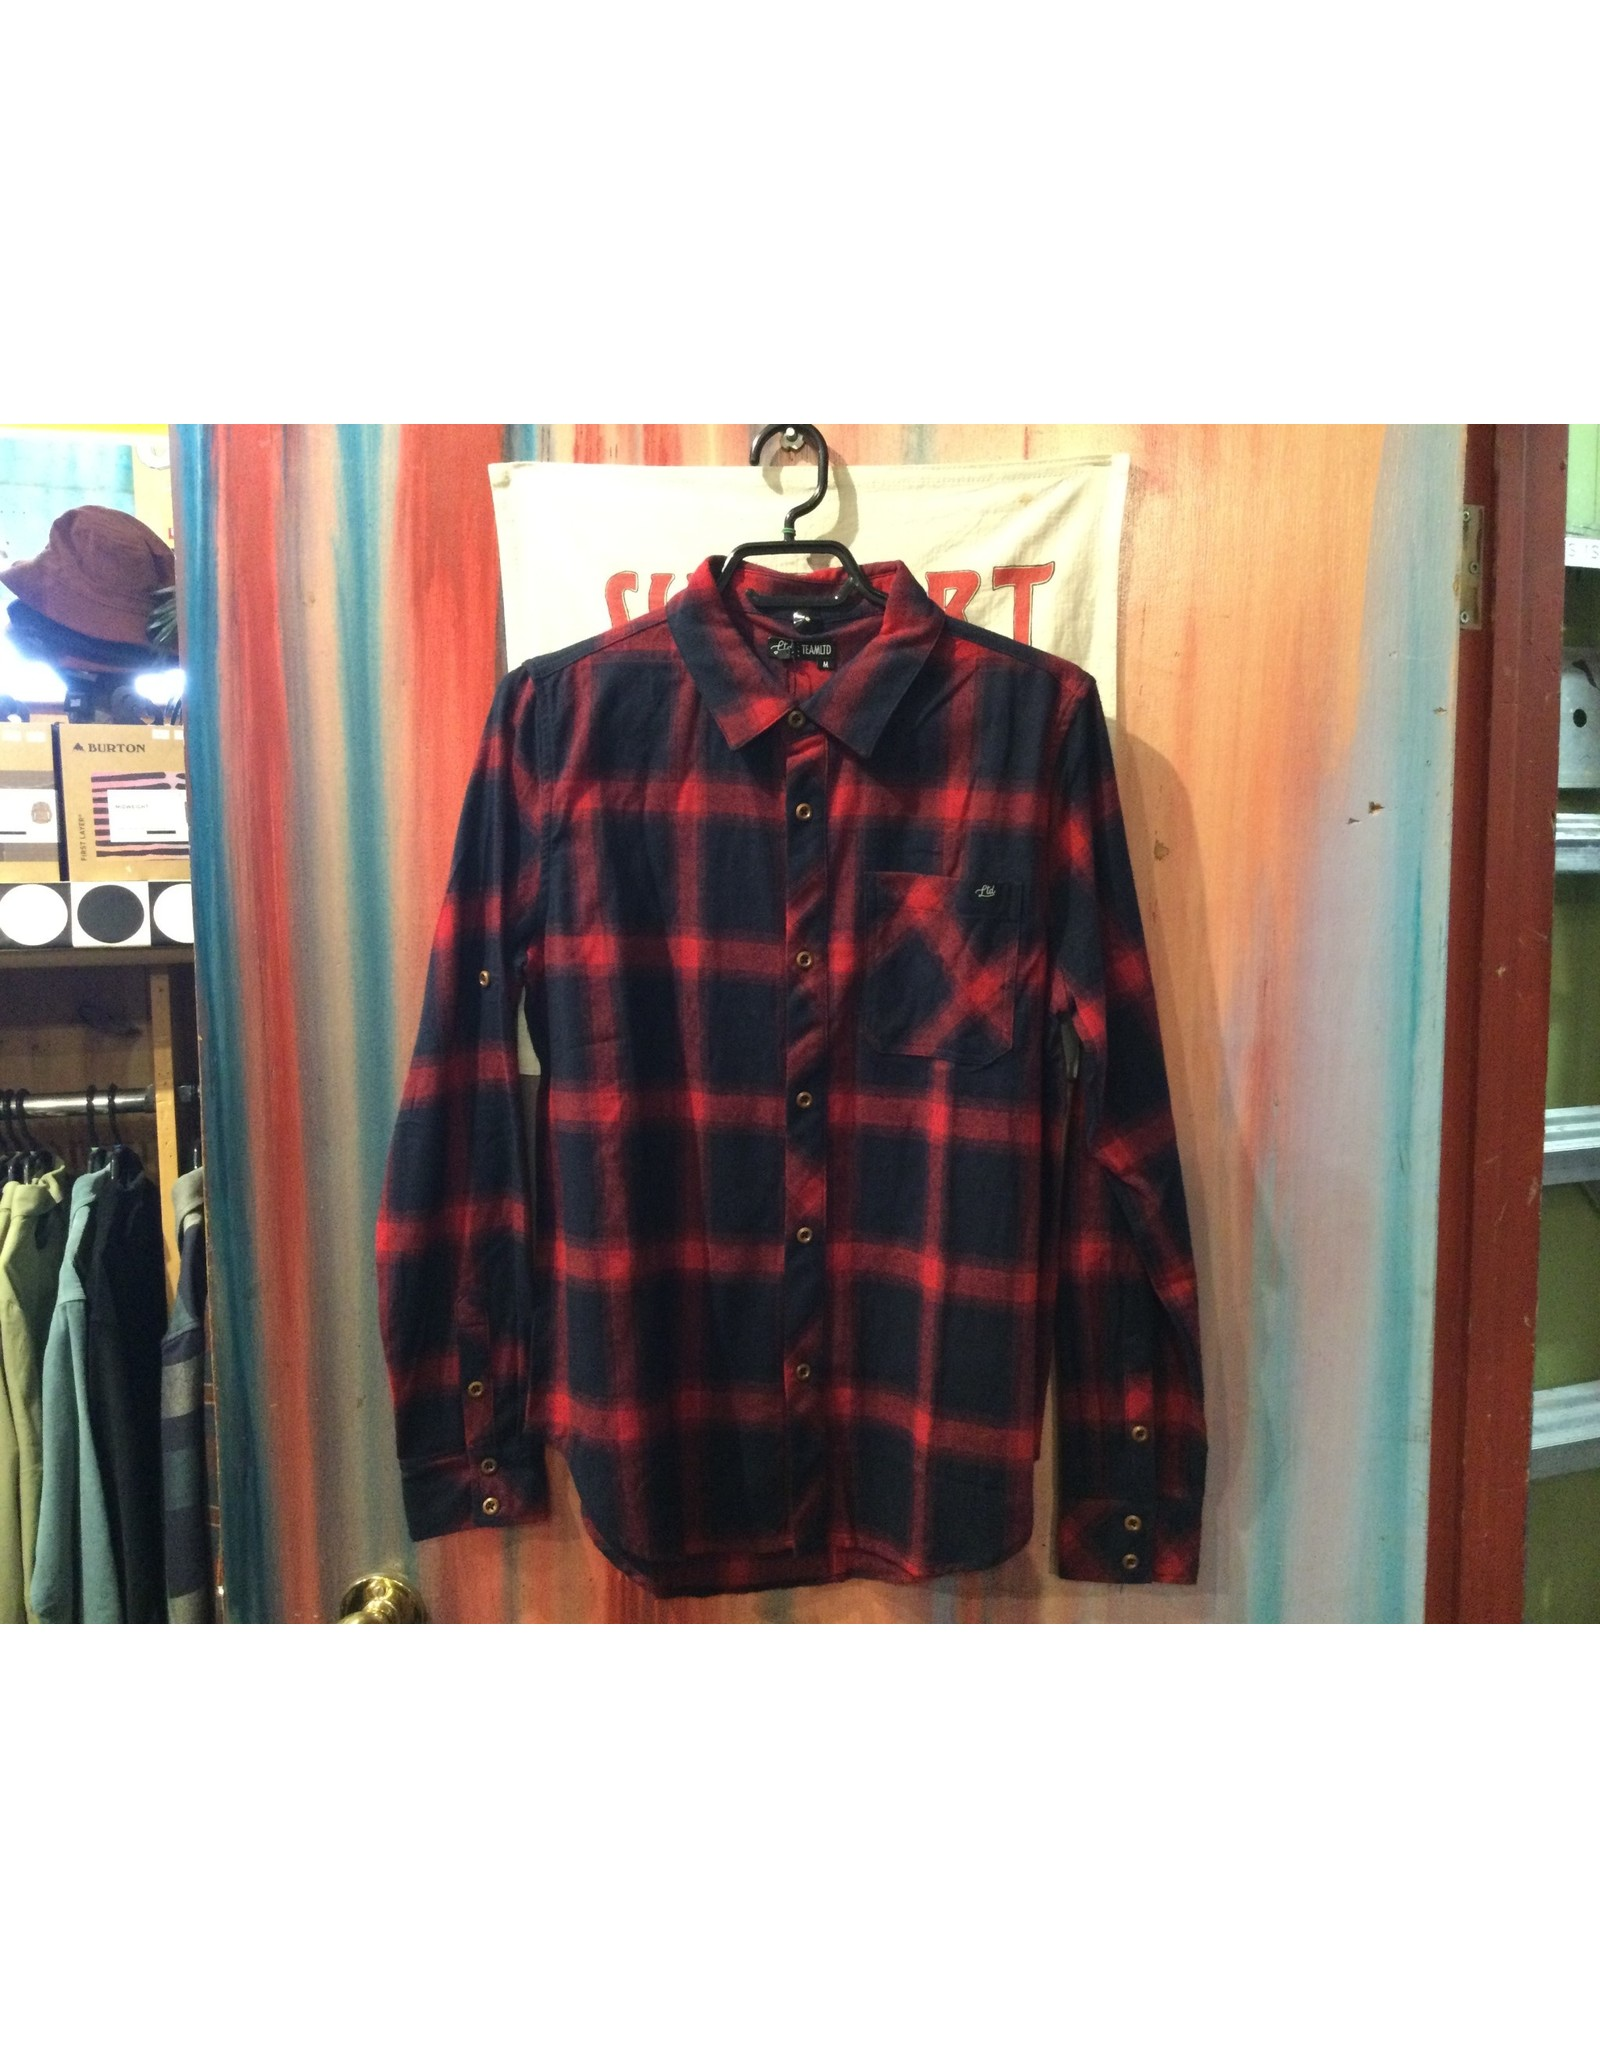 TEAMLTD Campfire Flannel